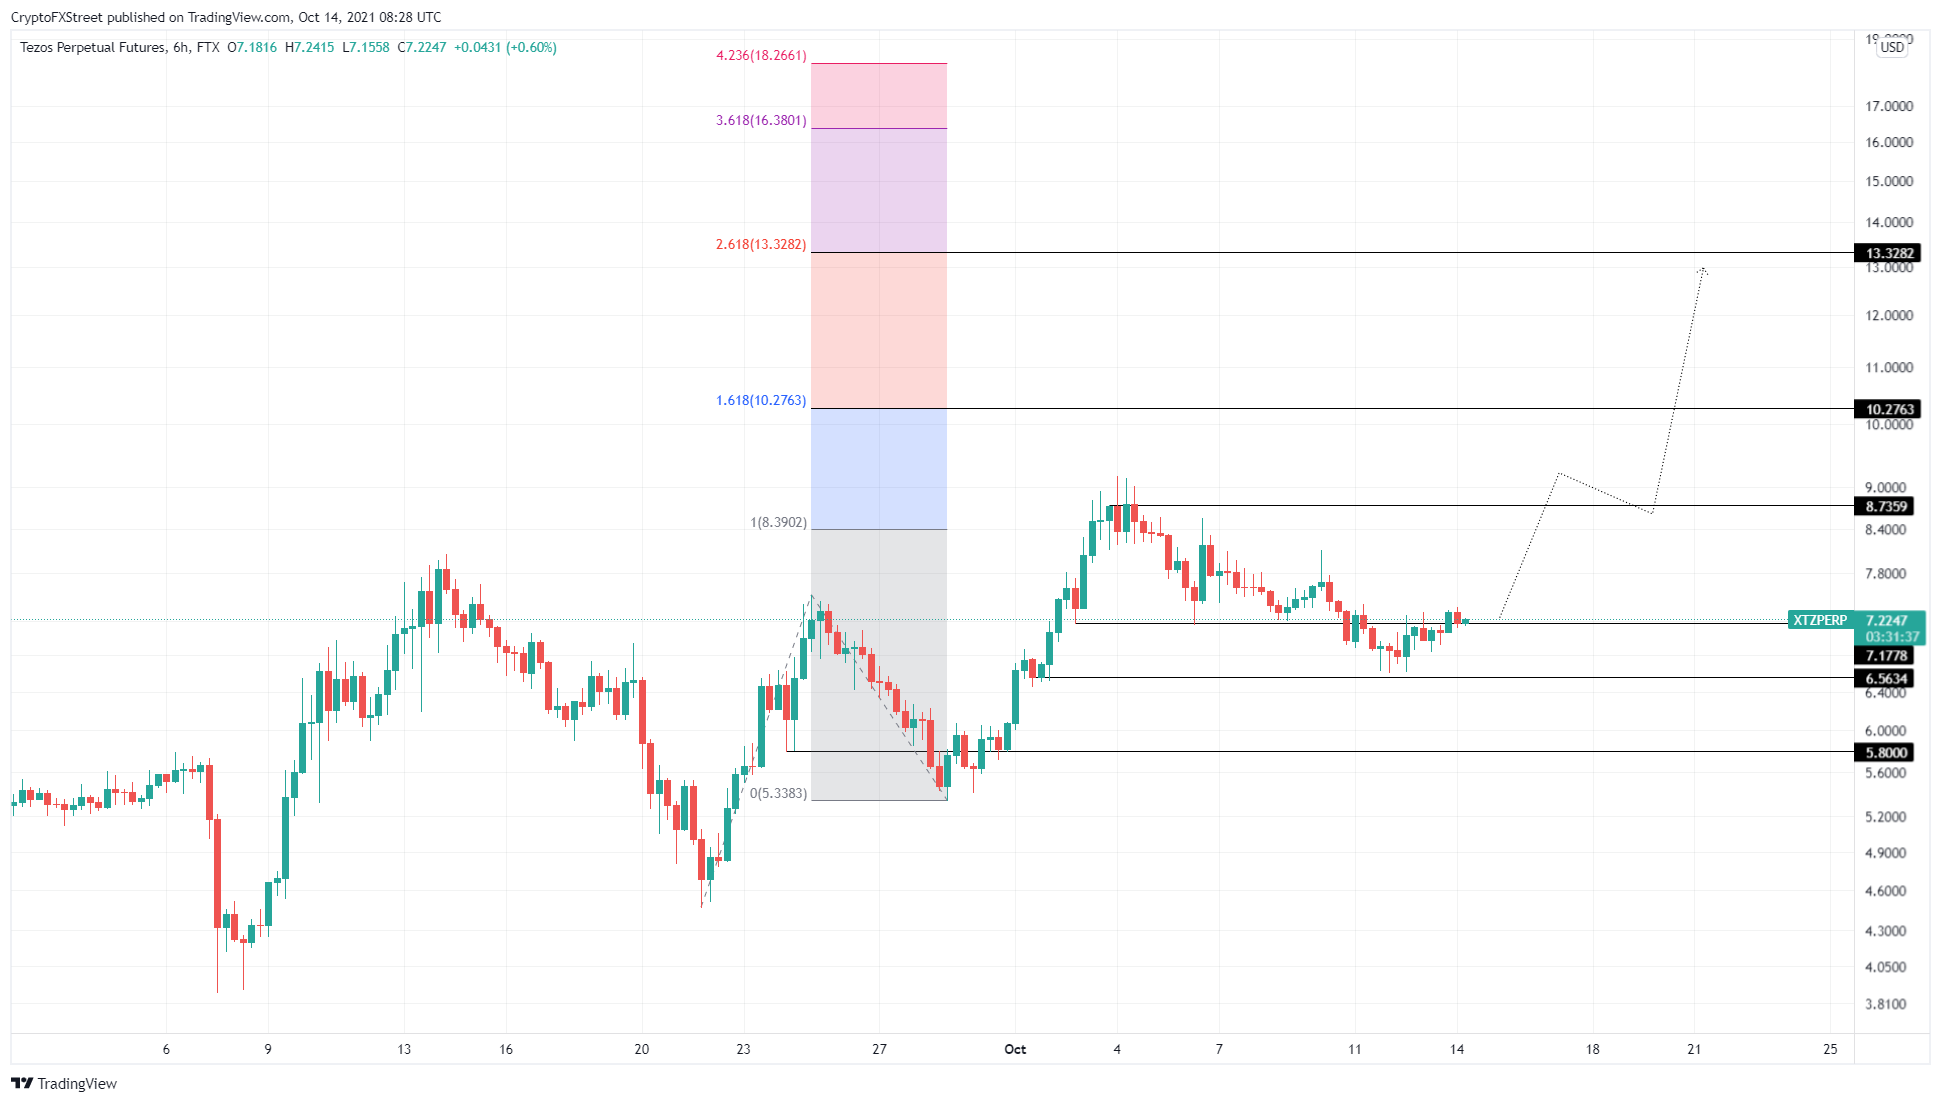 XTZ/USDT 6-hour chart